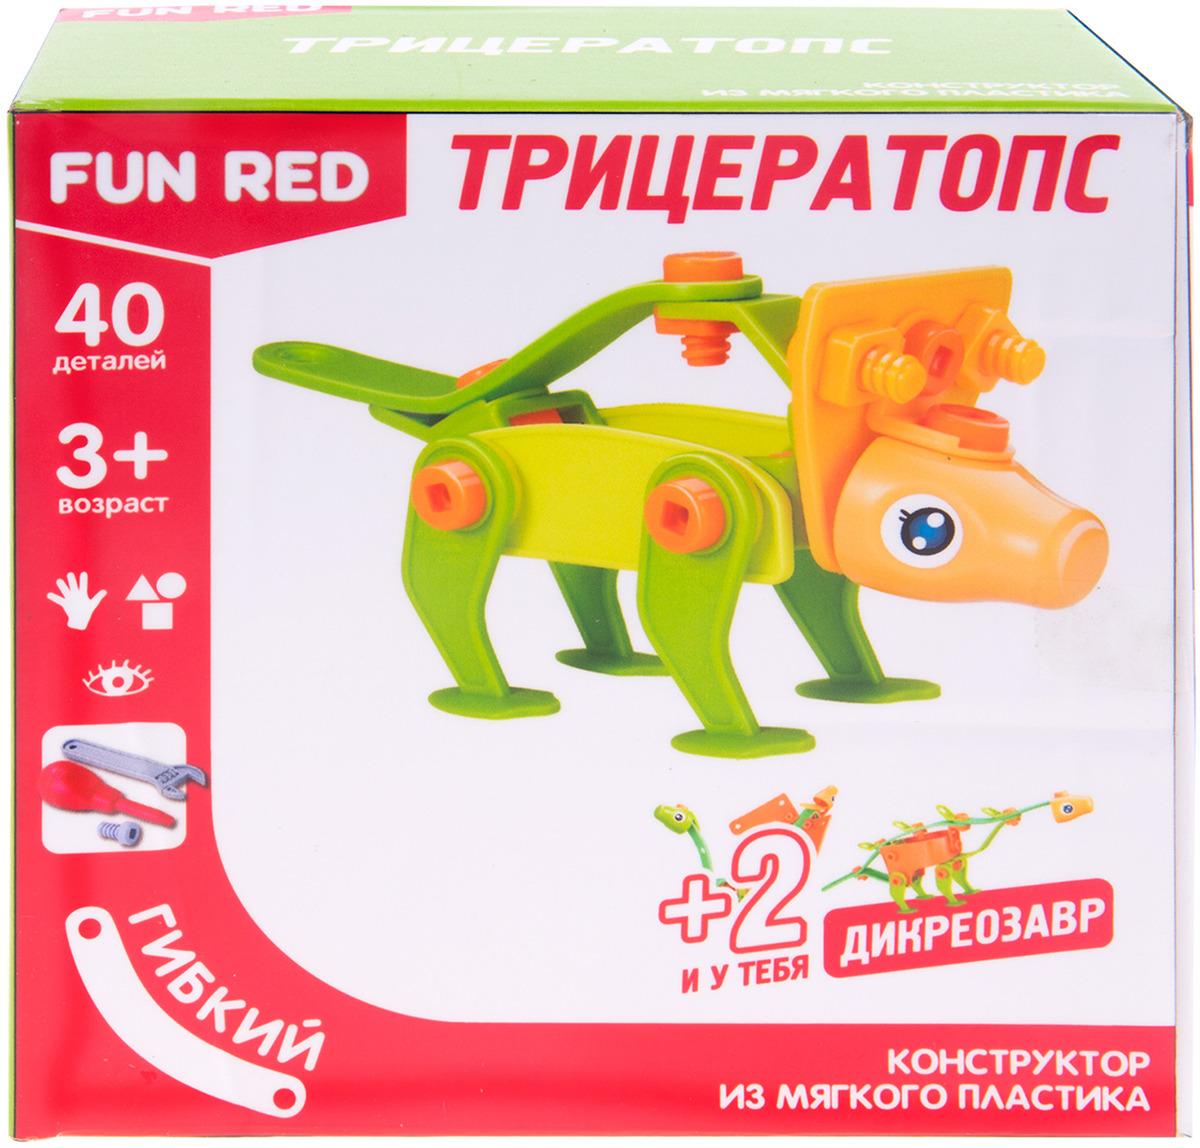 Конструктор Fun Red Трицератопс, 40 деталей конструктор серии рыцари 220 деталей